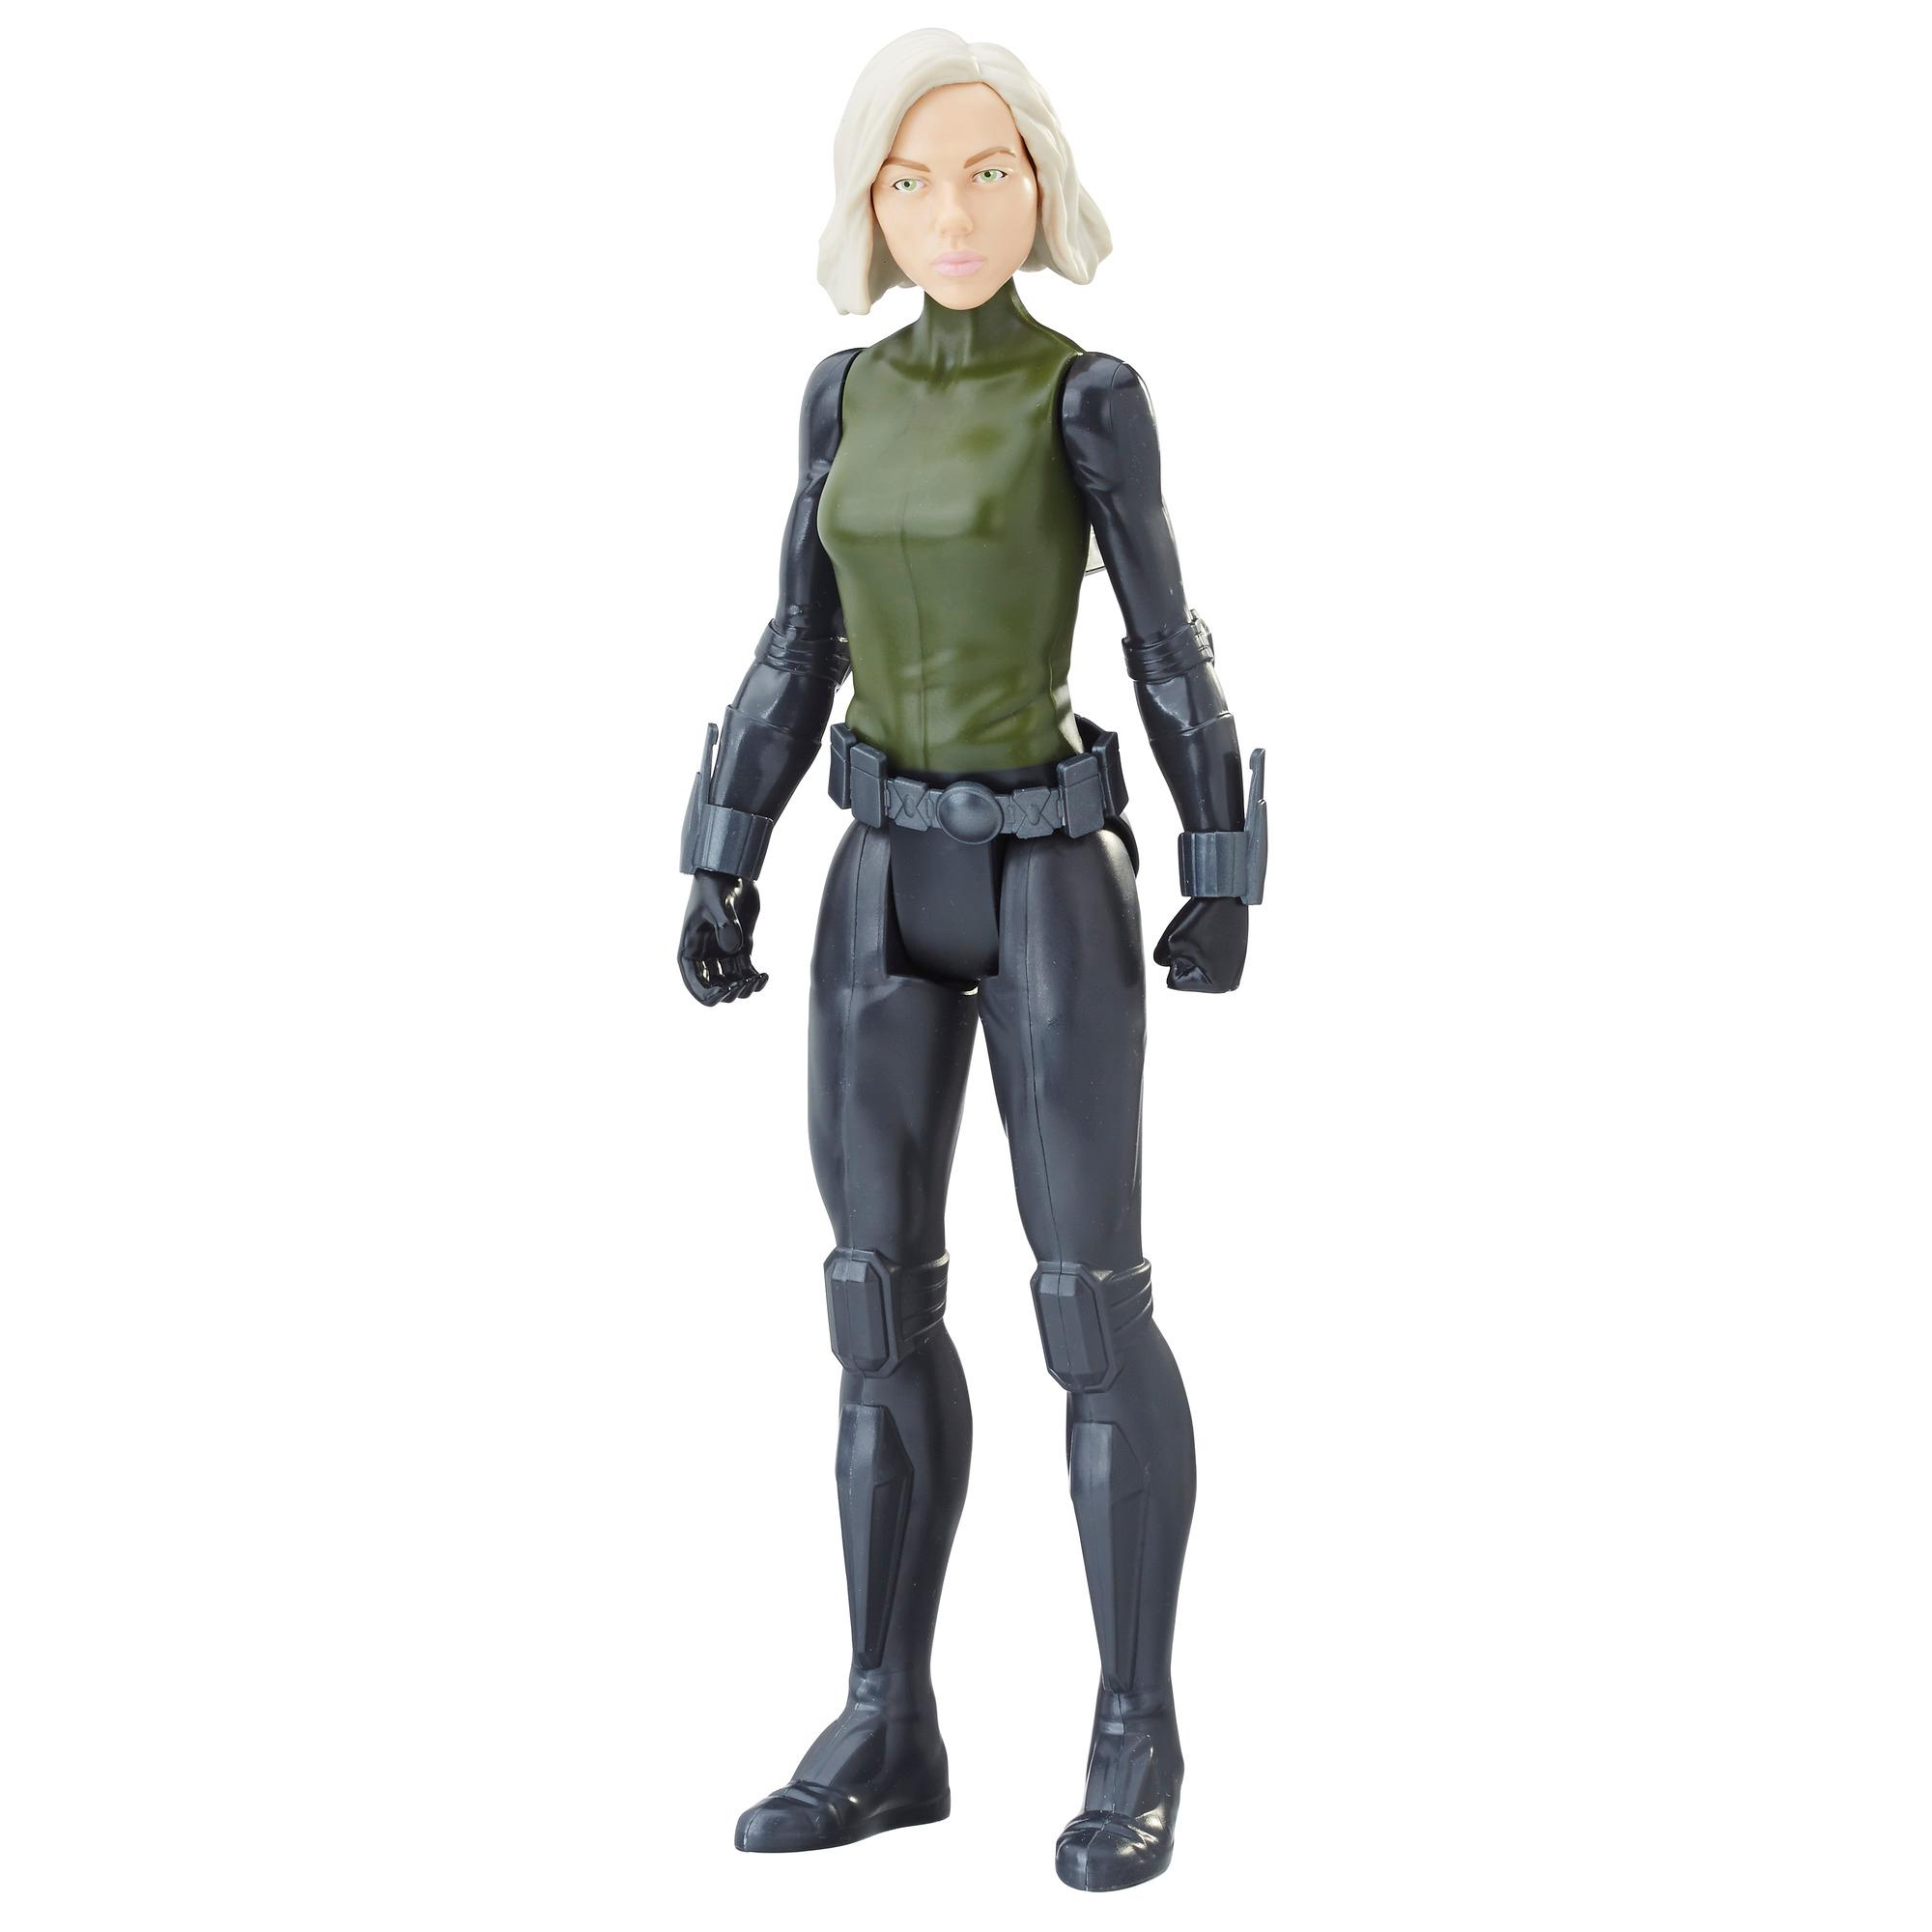 Marvel Infinity War Titan Hero Series - Black Widow con puerto para Titan Hero Power FX